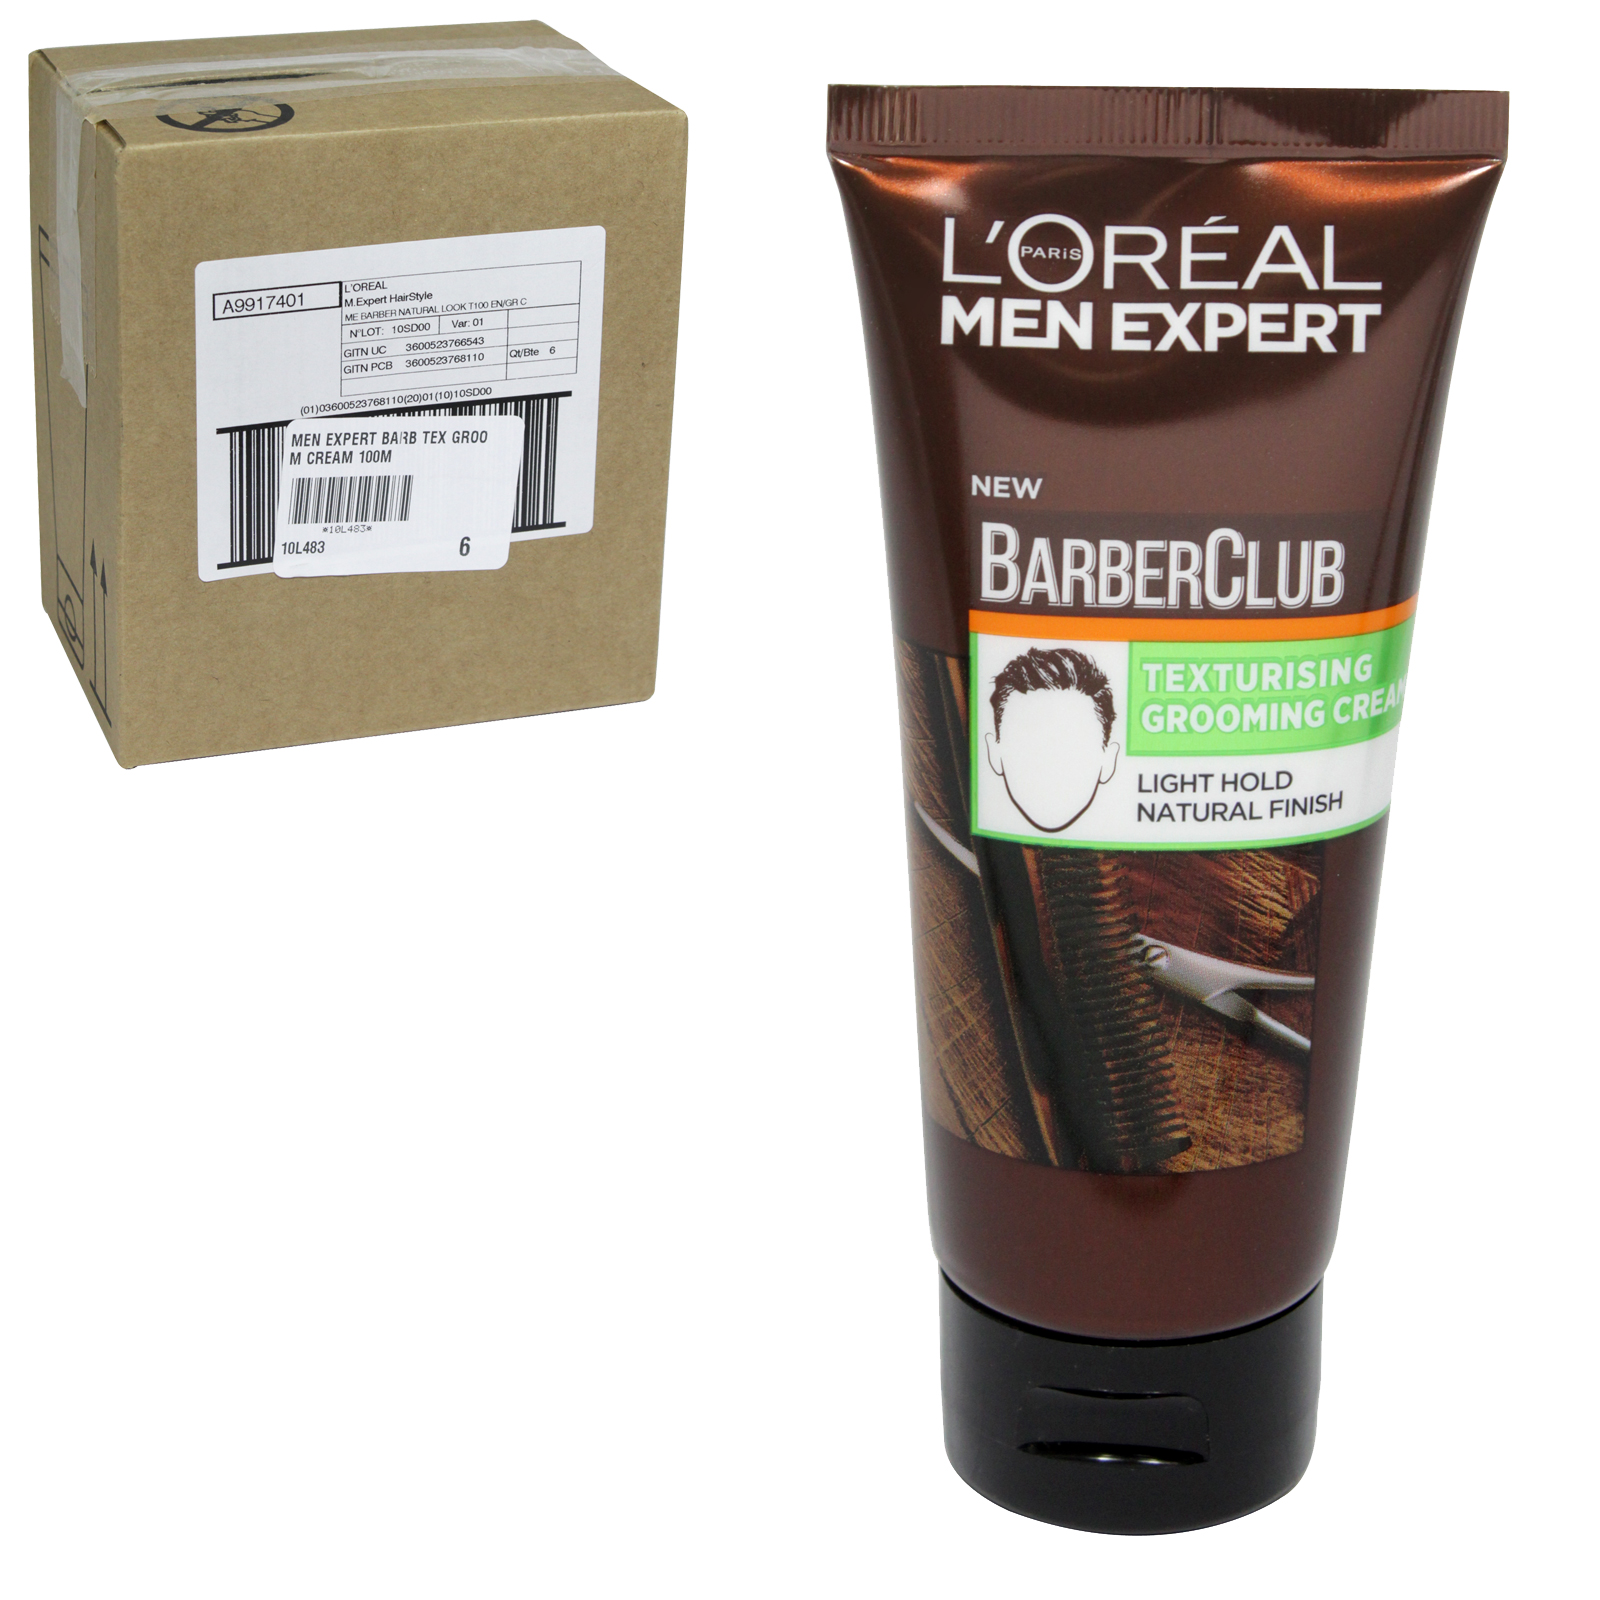 MEN EXPERT BARBERCLUB TEXURISING GROOMING CREAM 100M X 6